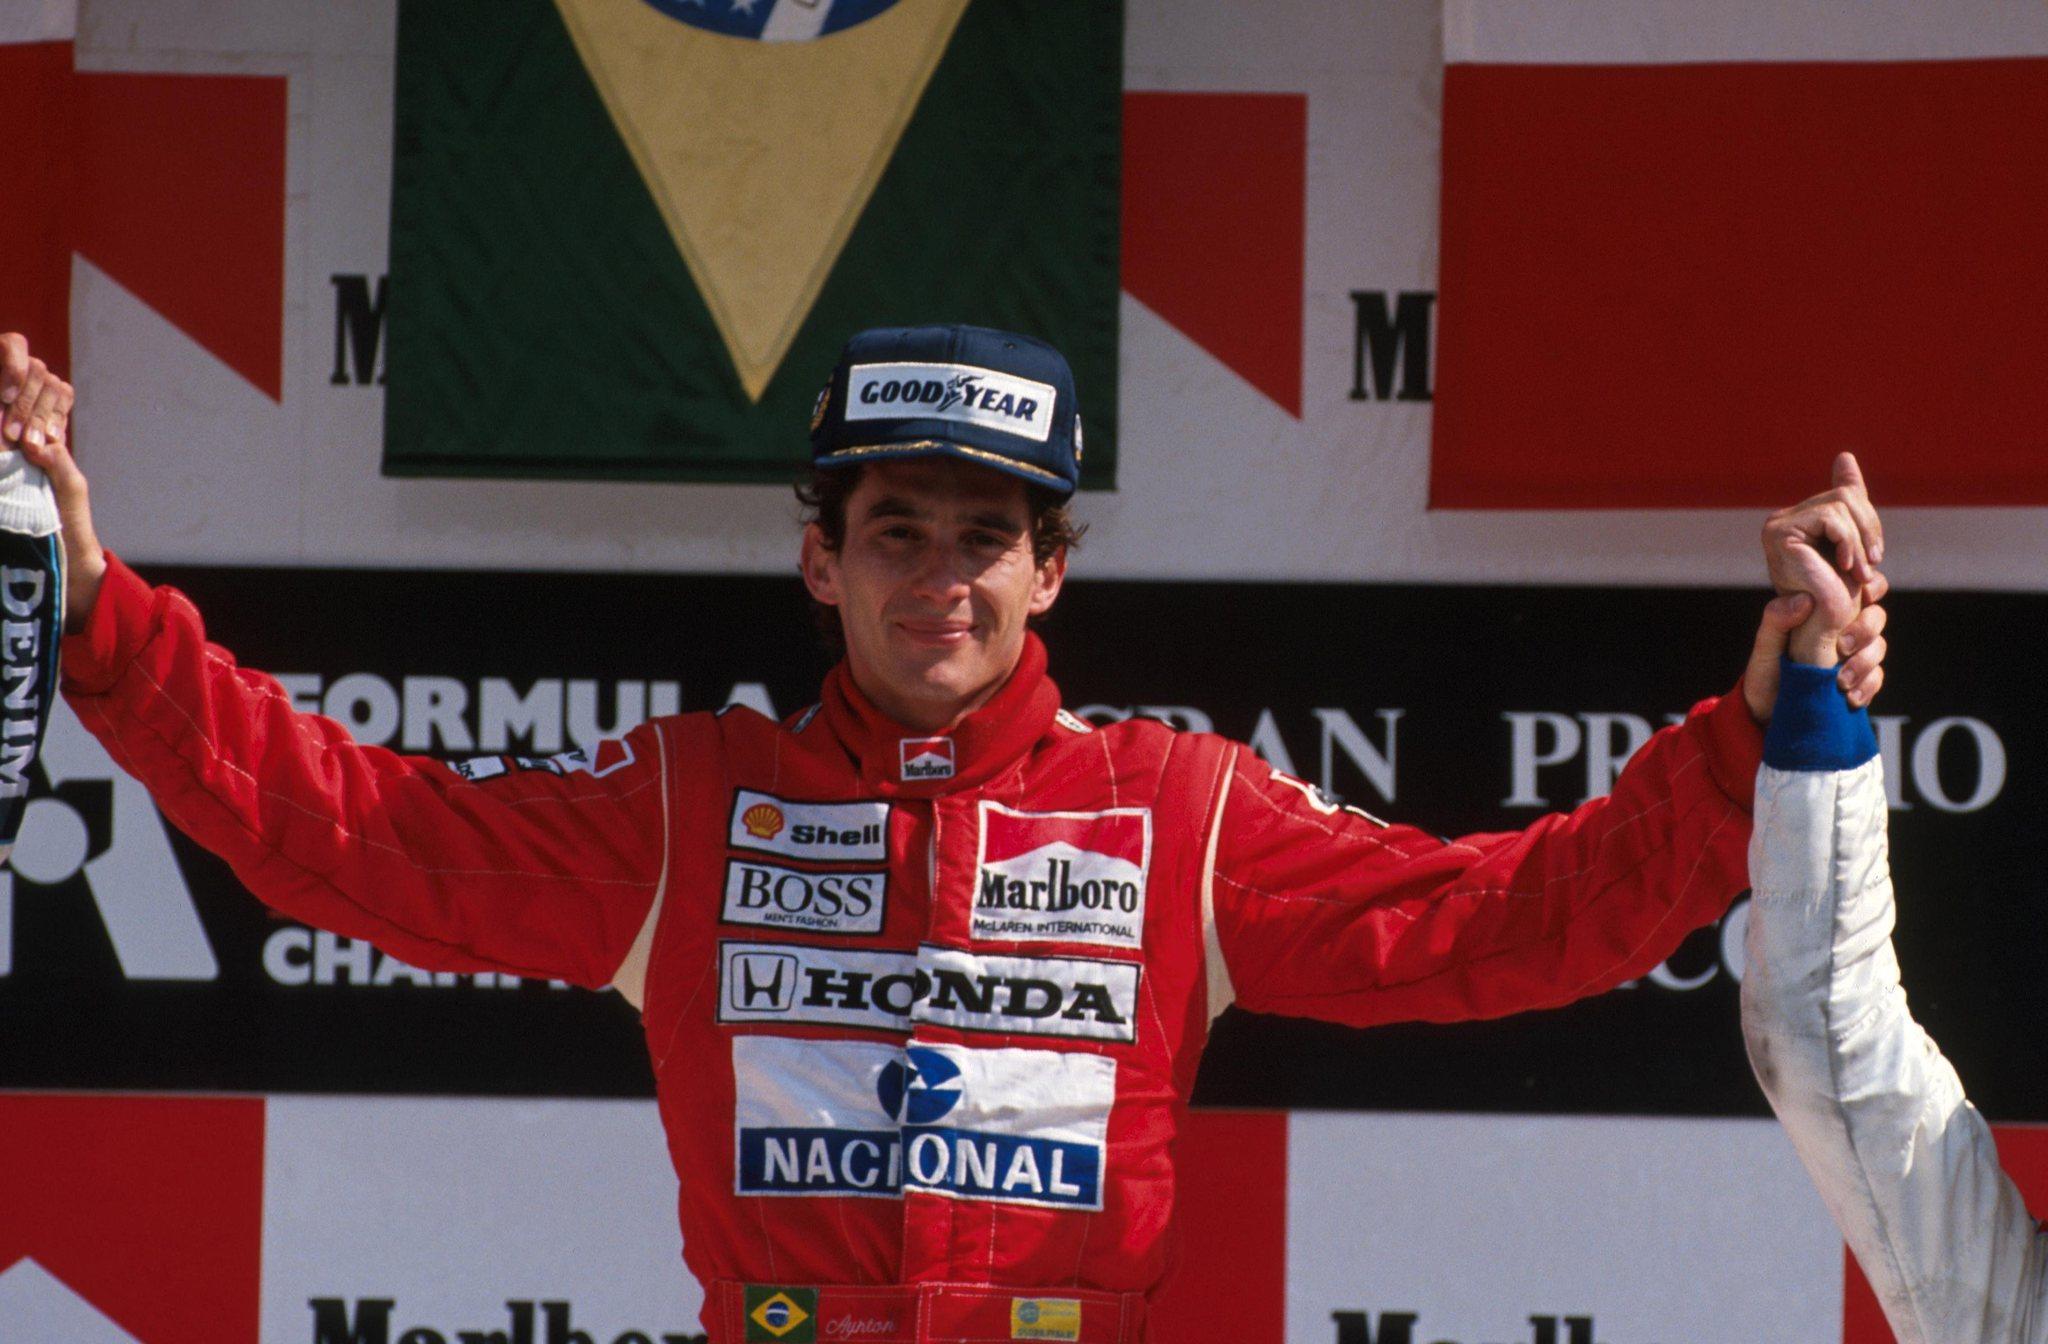 Ayrton Senna won the 1989 Mexican Grand Prix (Photo: taringa.net)